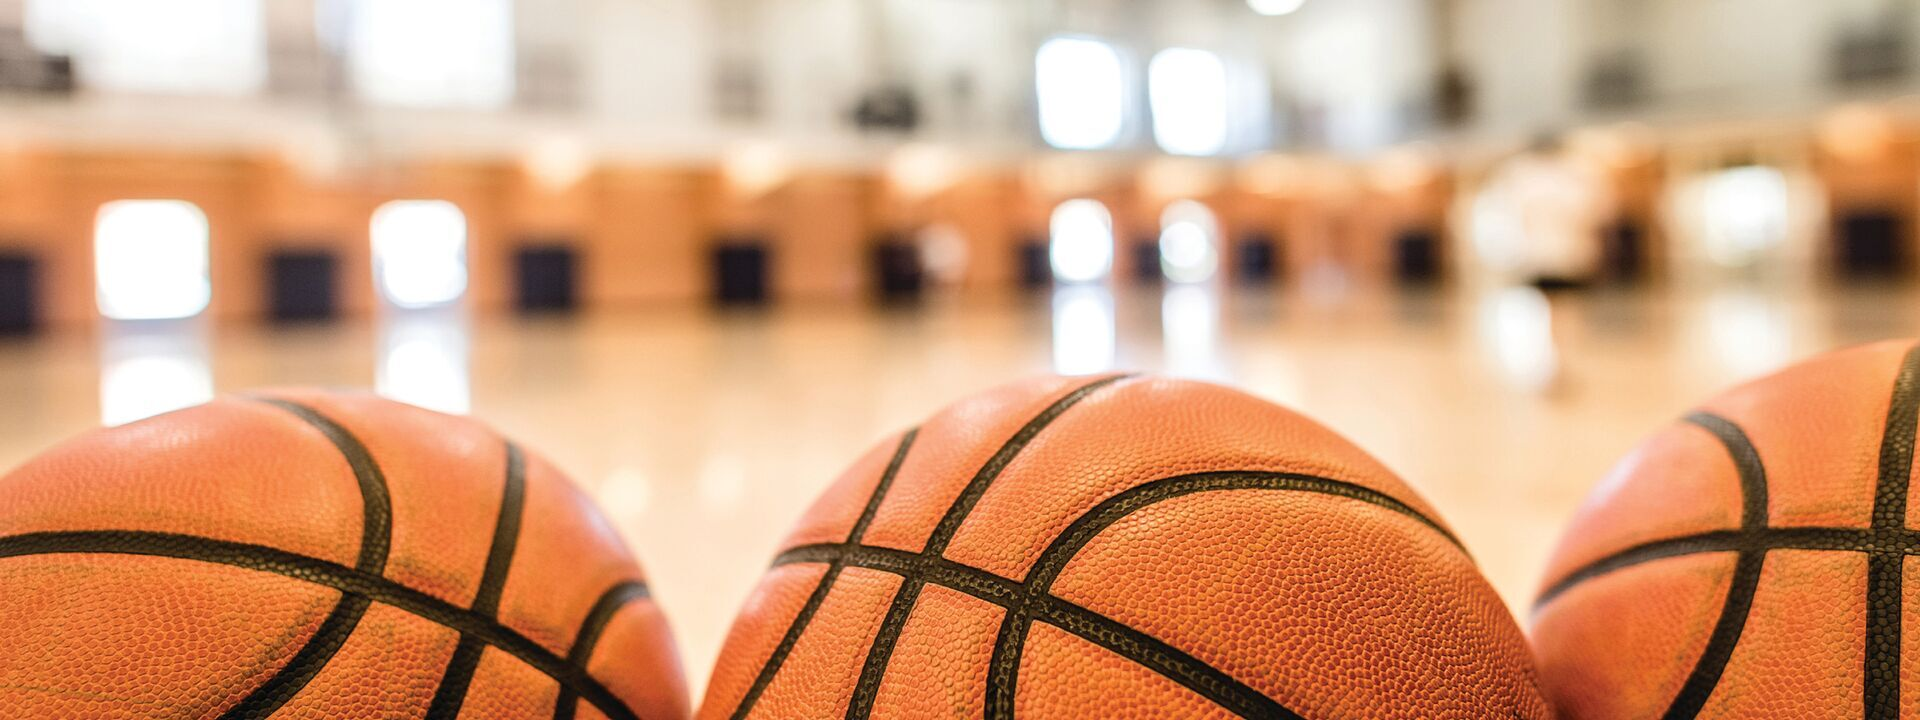 Three basketballs on the floor